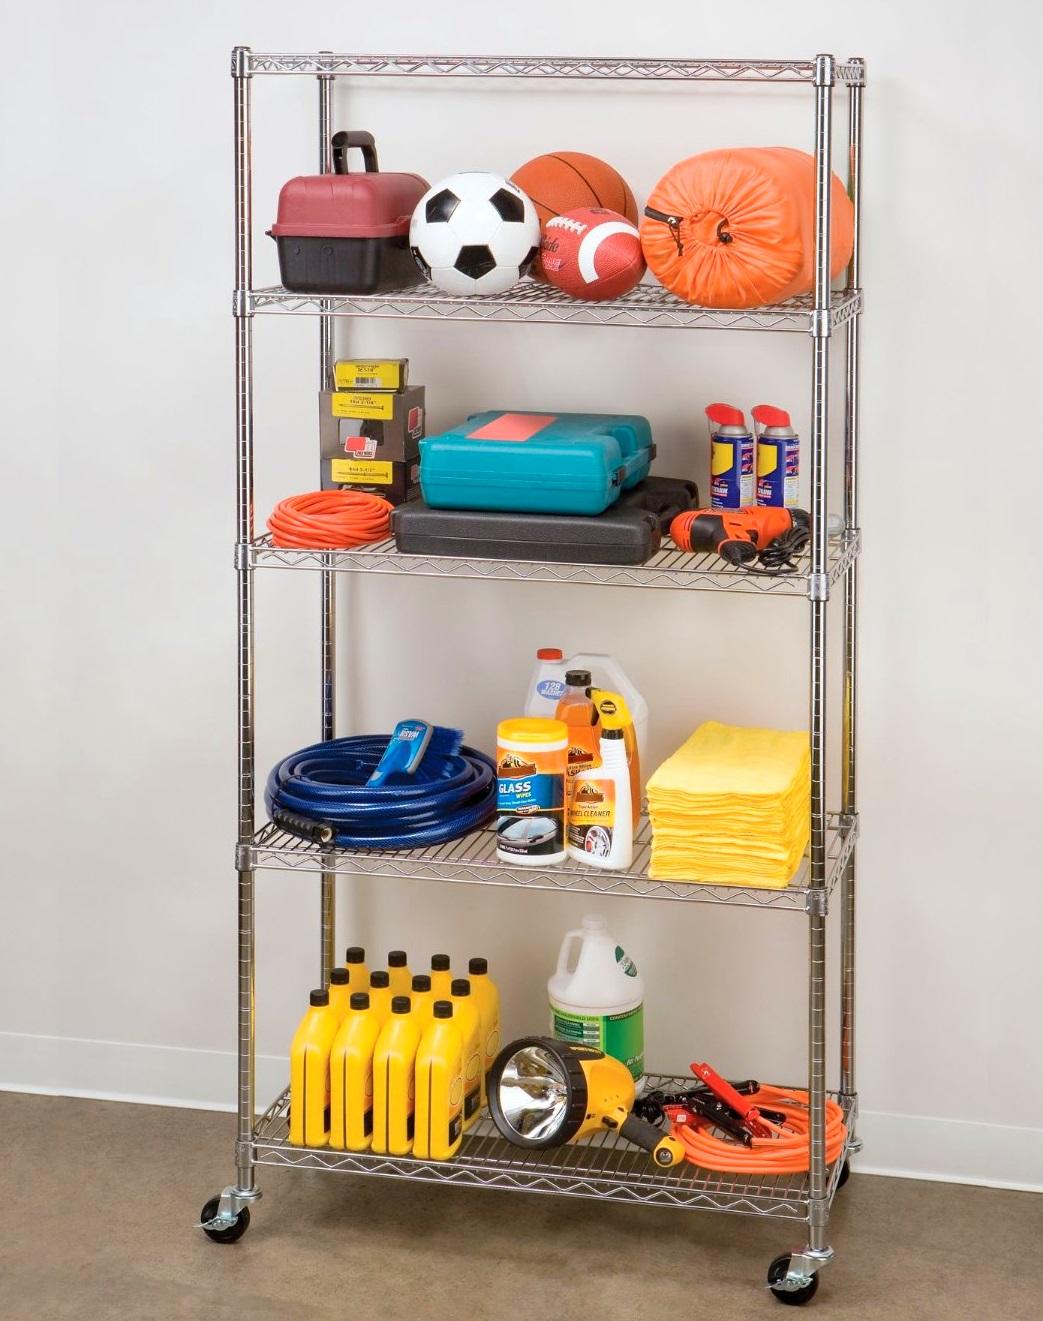 Smart Garage Organization Ideas - Use a rack to help organize clutter the garage